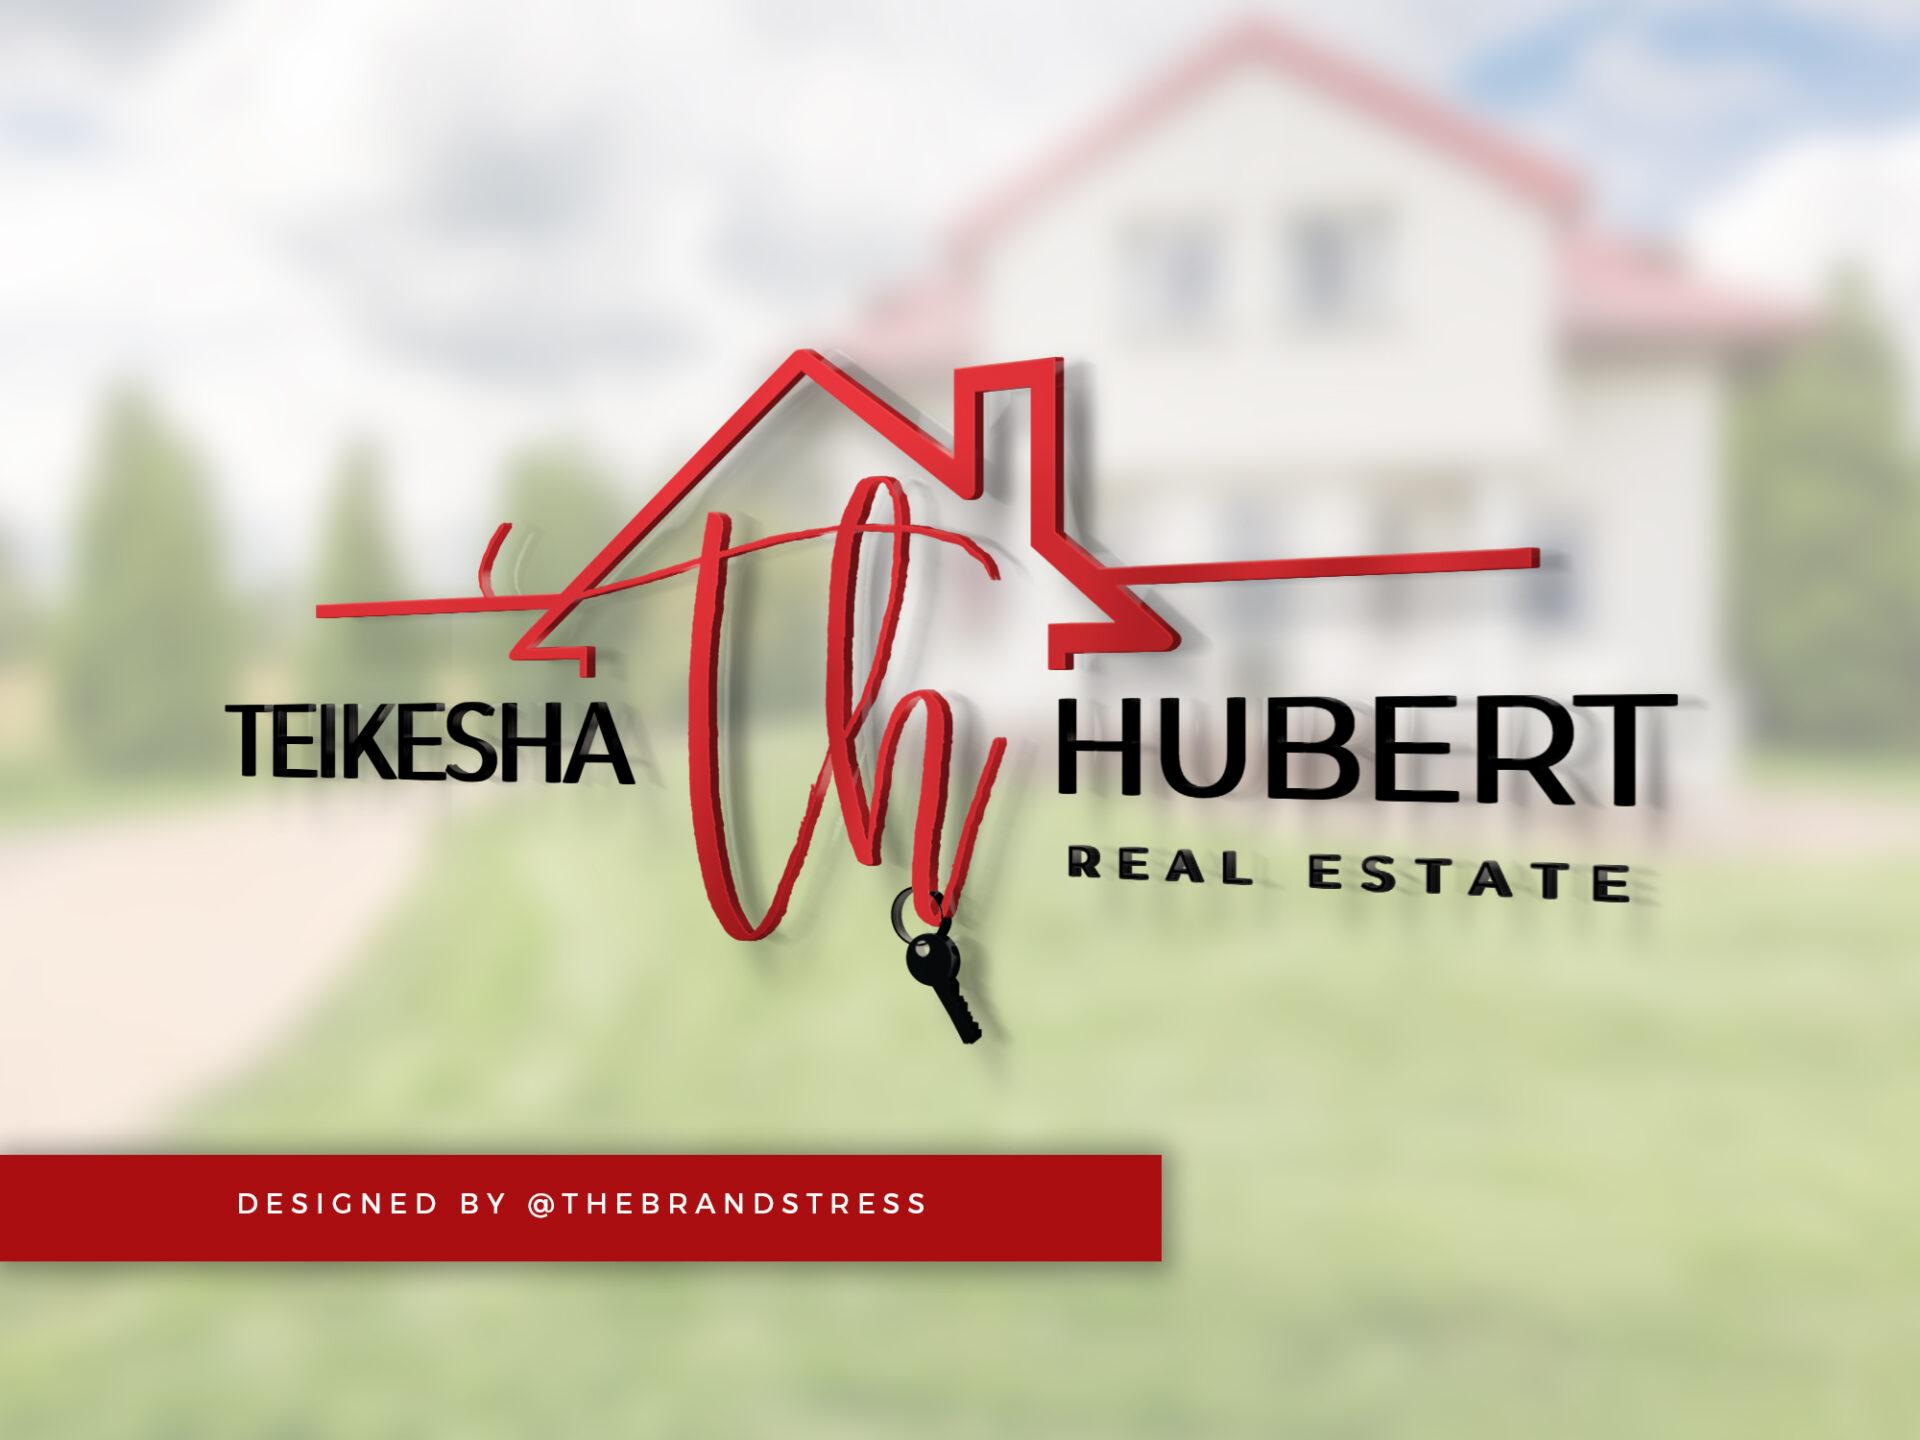 Teikesha Hubert Real Estate